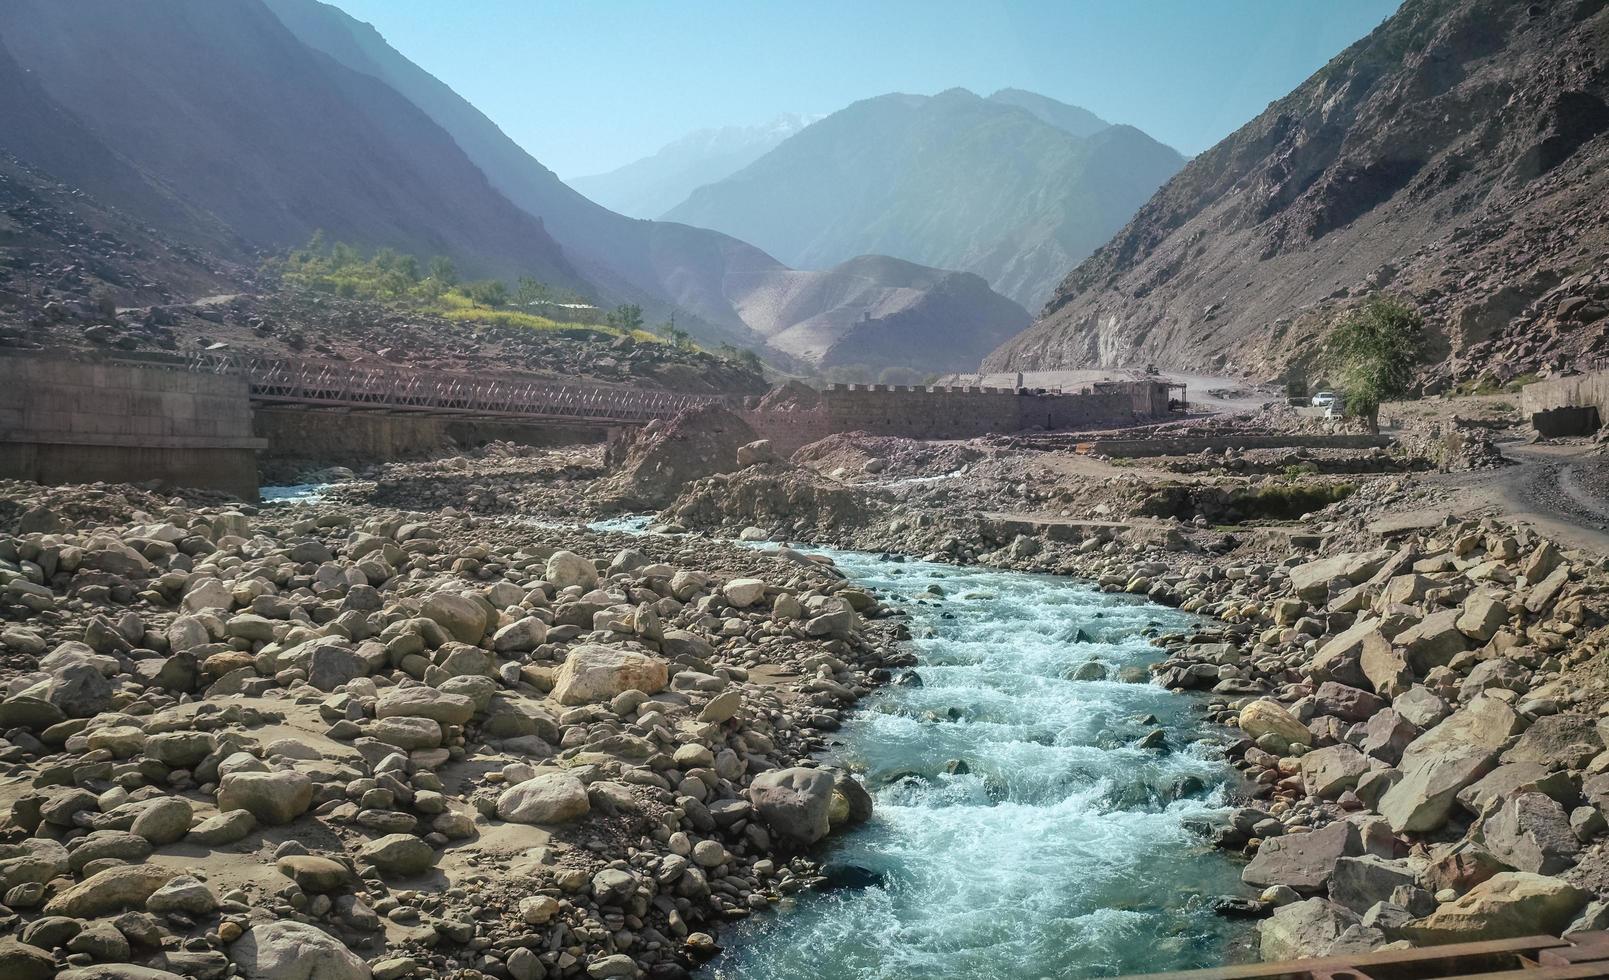 flödande flod längs karakoram bergskedja på sommaren foto